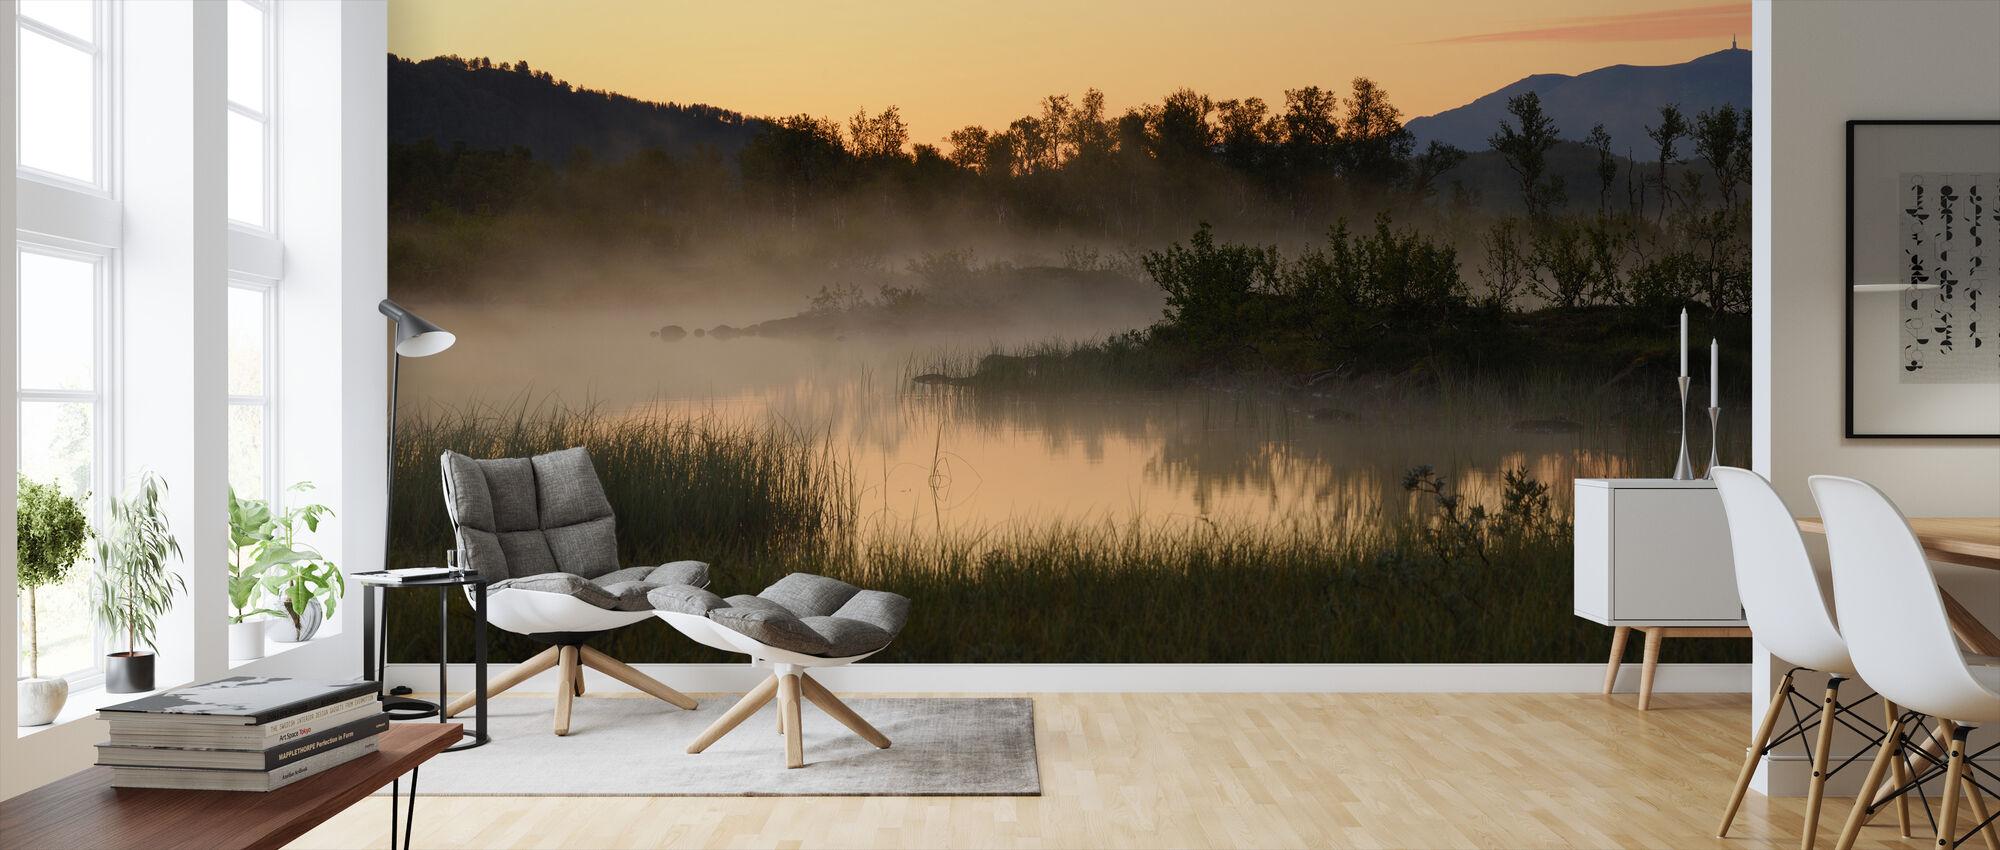 Evening Fog over Lake, Senja Norway - Wallpaper - Living Room